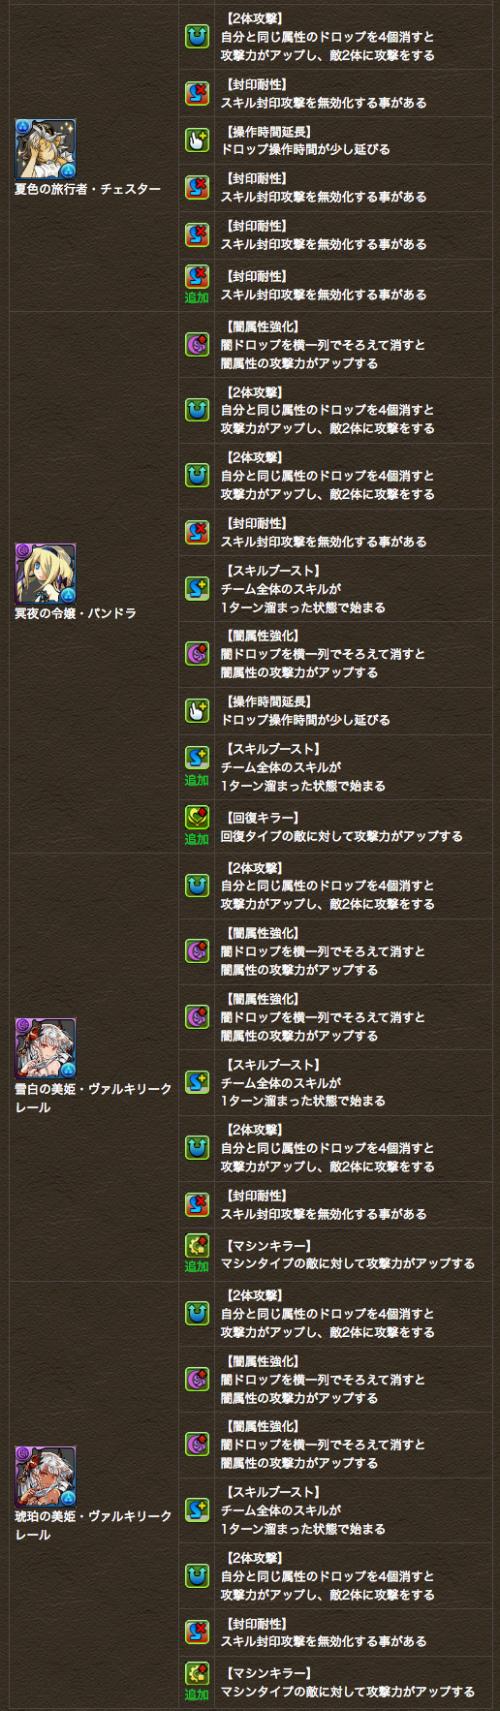 20160805181248c25.jpg